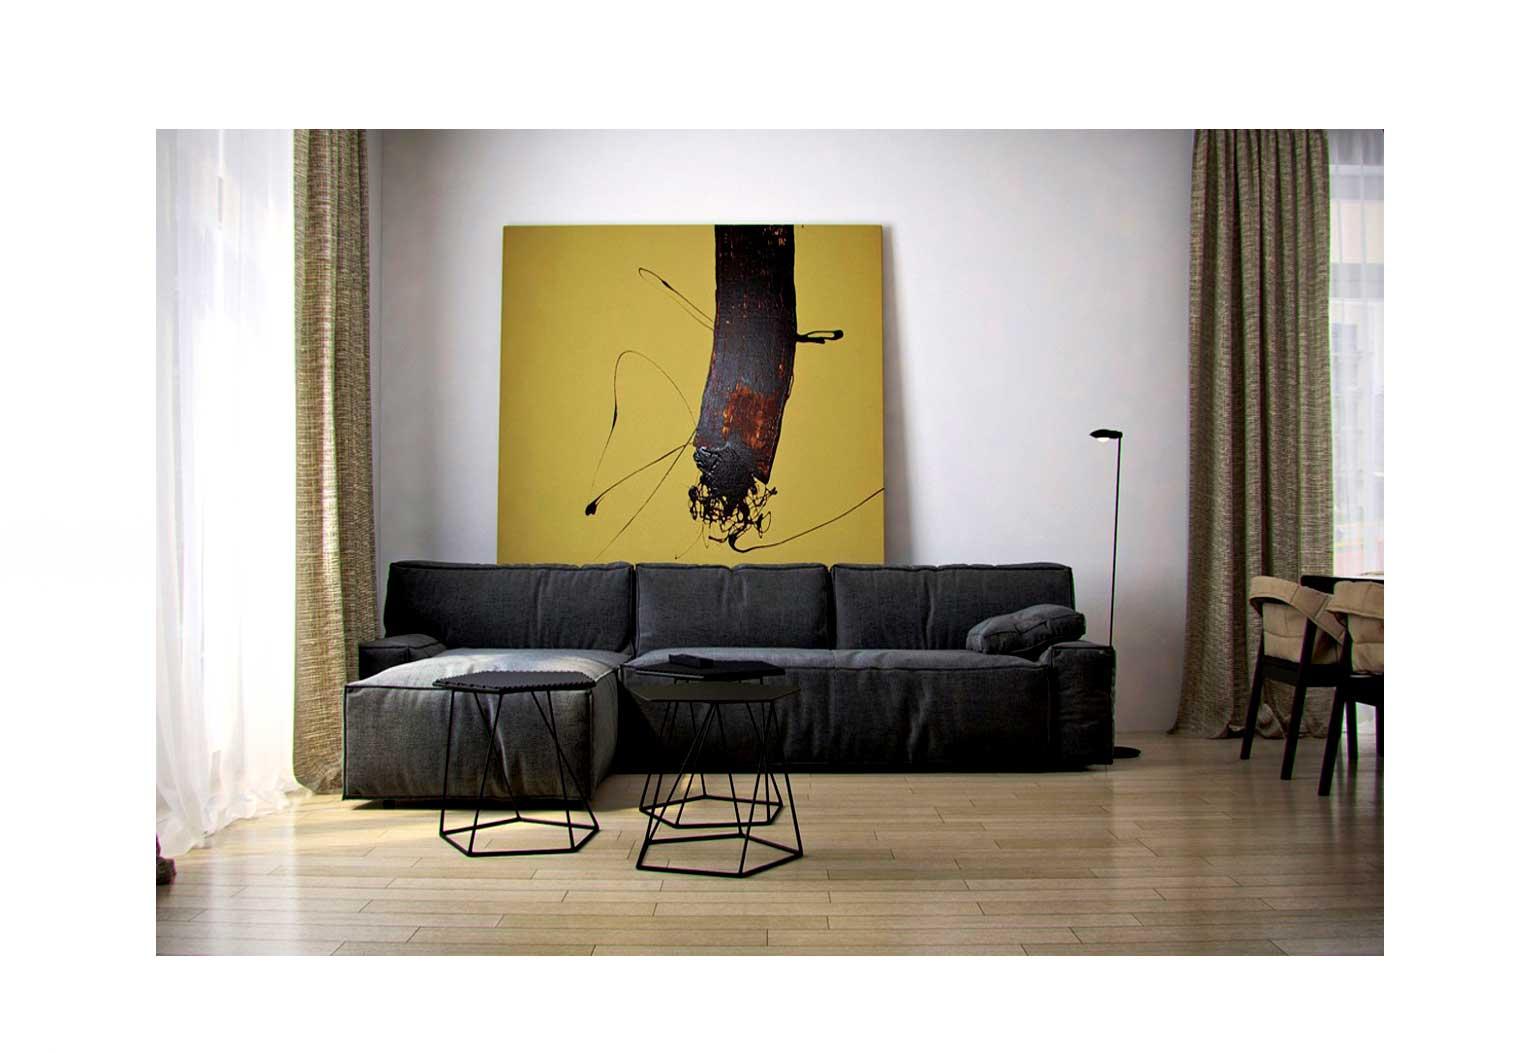 Design An Art centric Room06jpg - چگونه یک اتاق هنری را طراحی کنیم؟